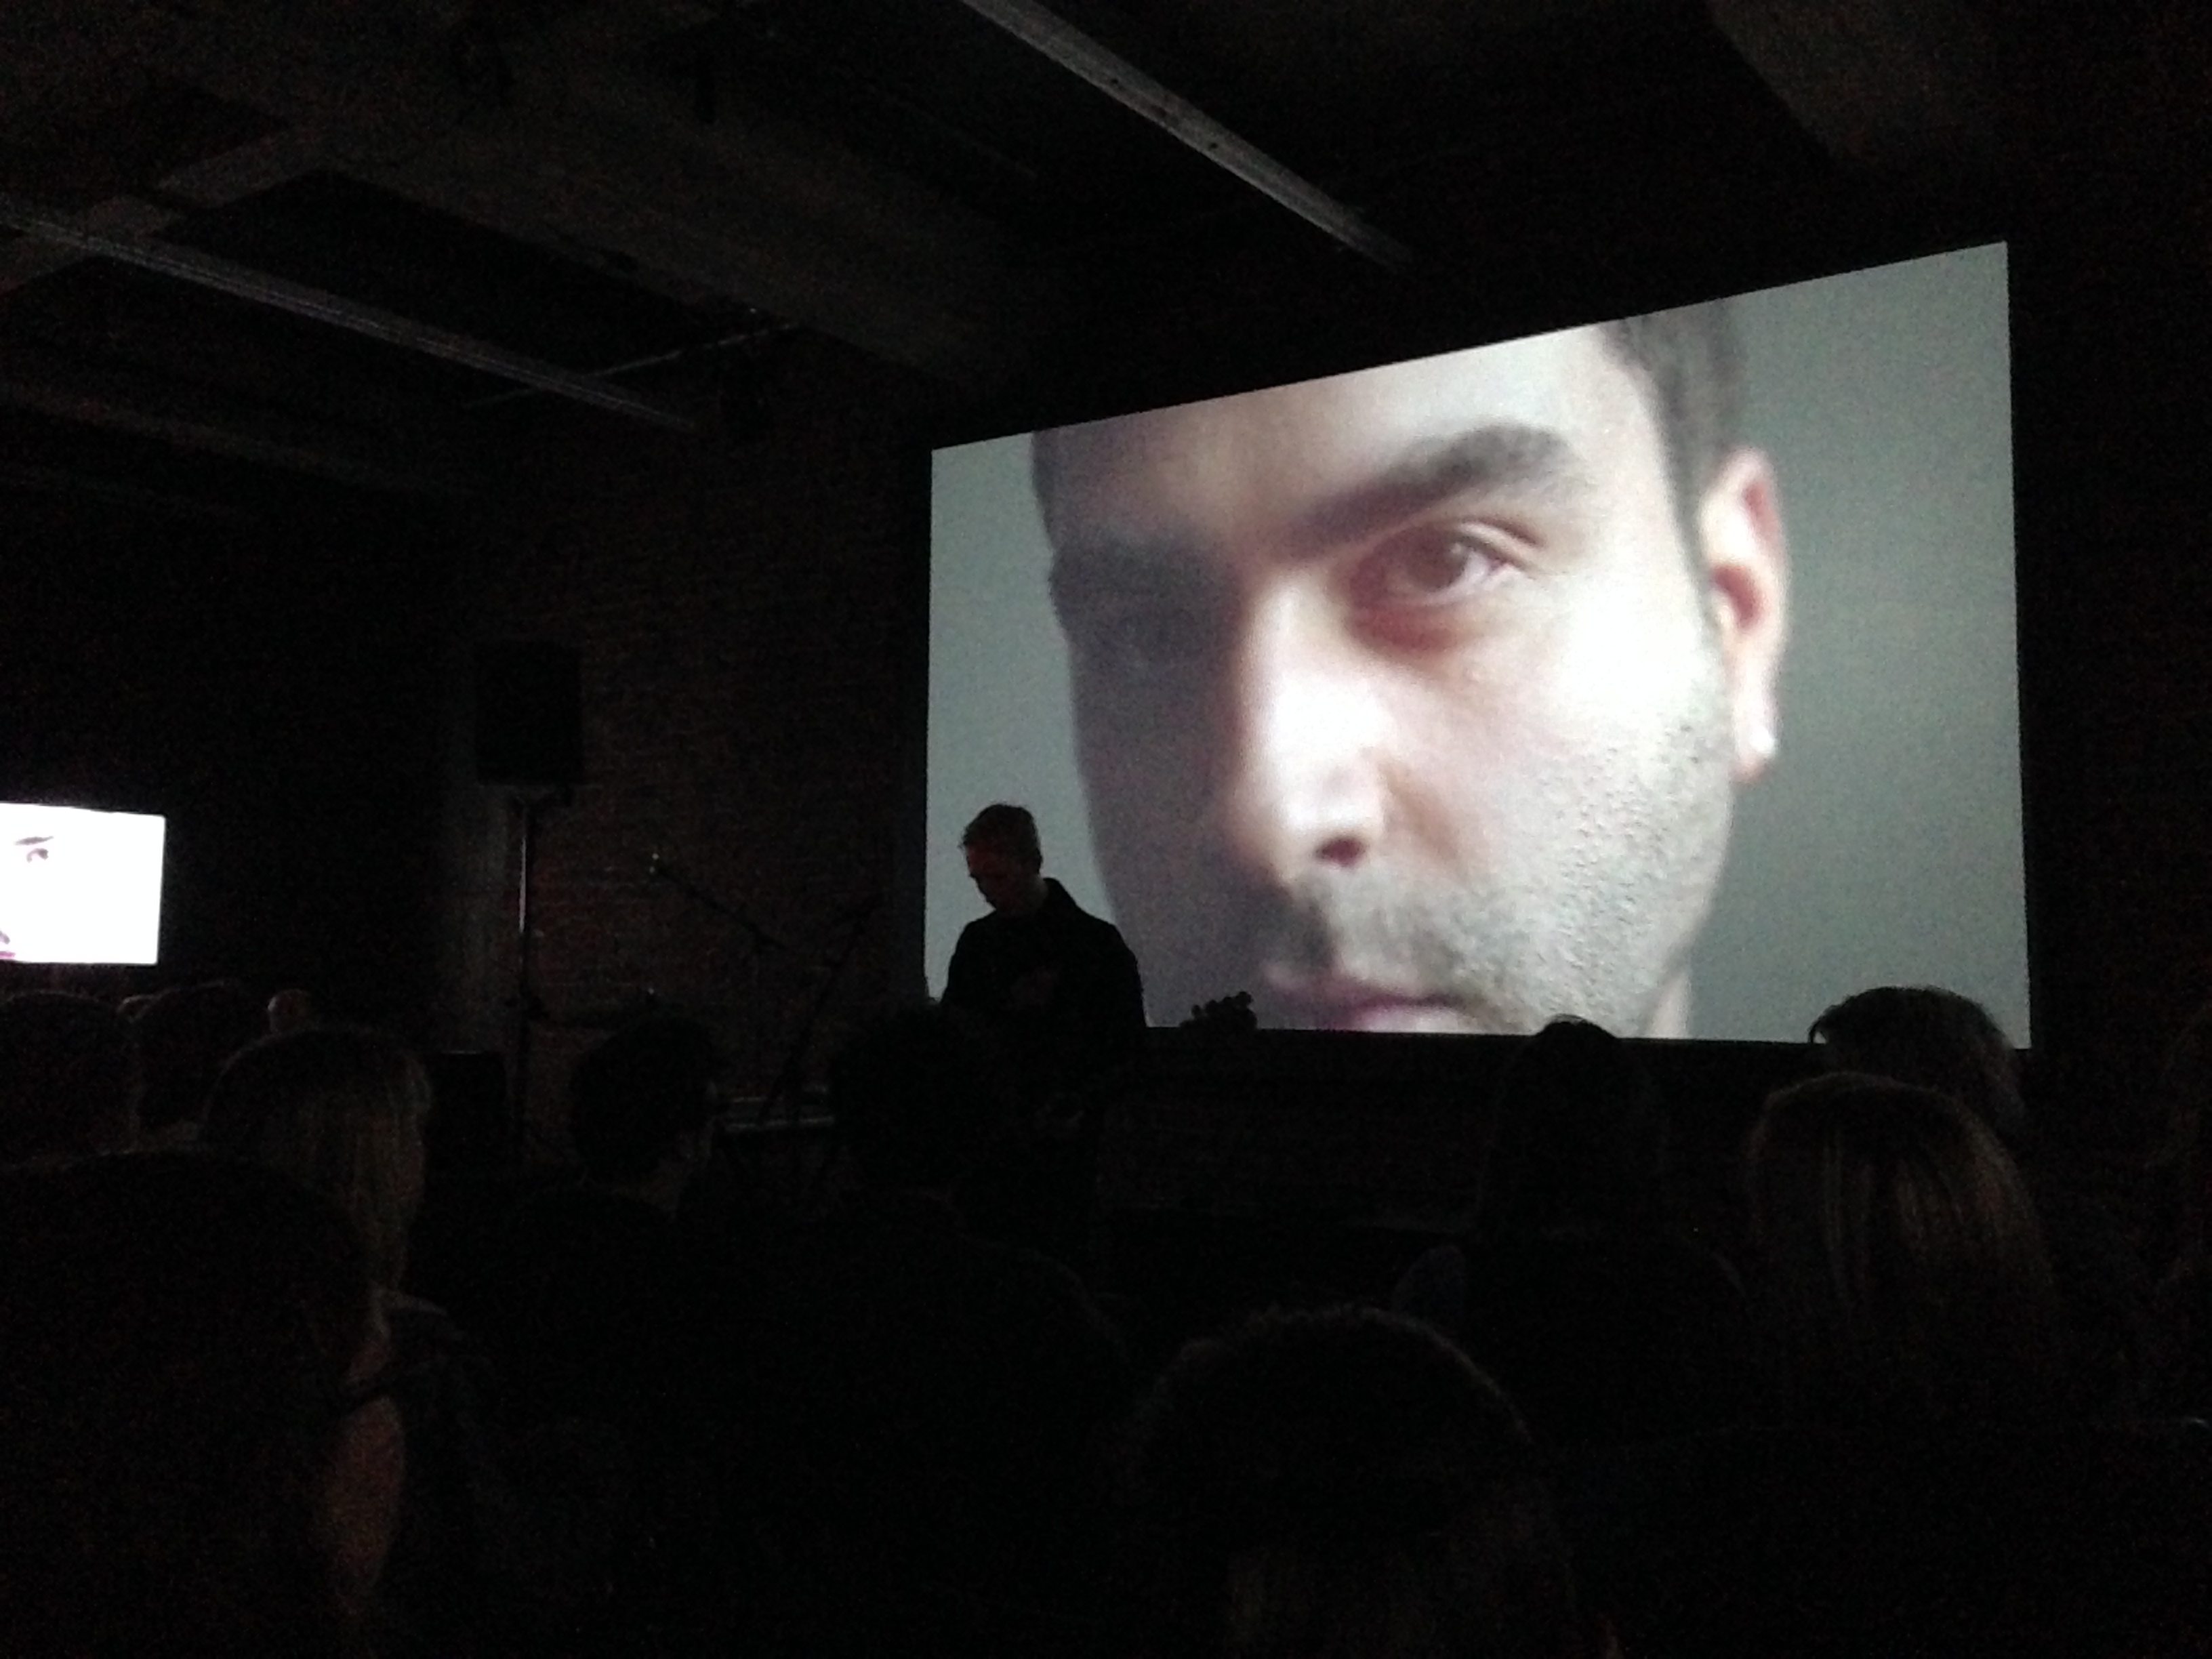 Design, Fashion, music, Kortrijk, Goose, trend, Biennale Interieur, Budatoren, Nicolas Karakatsanis, Willy Vandeperre, deconstruction, performance